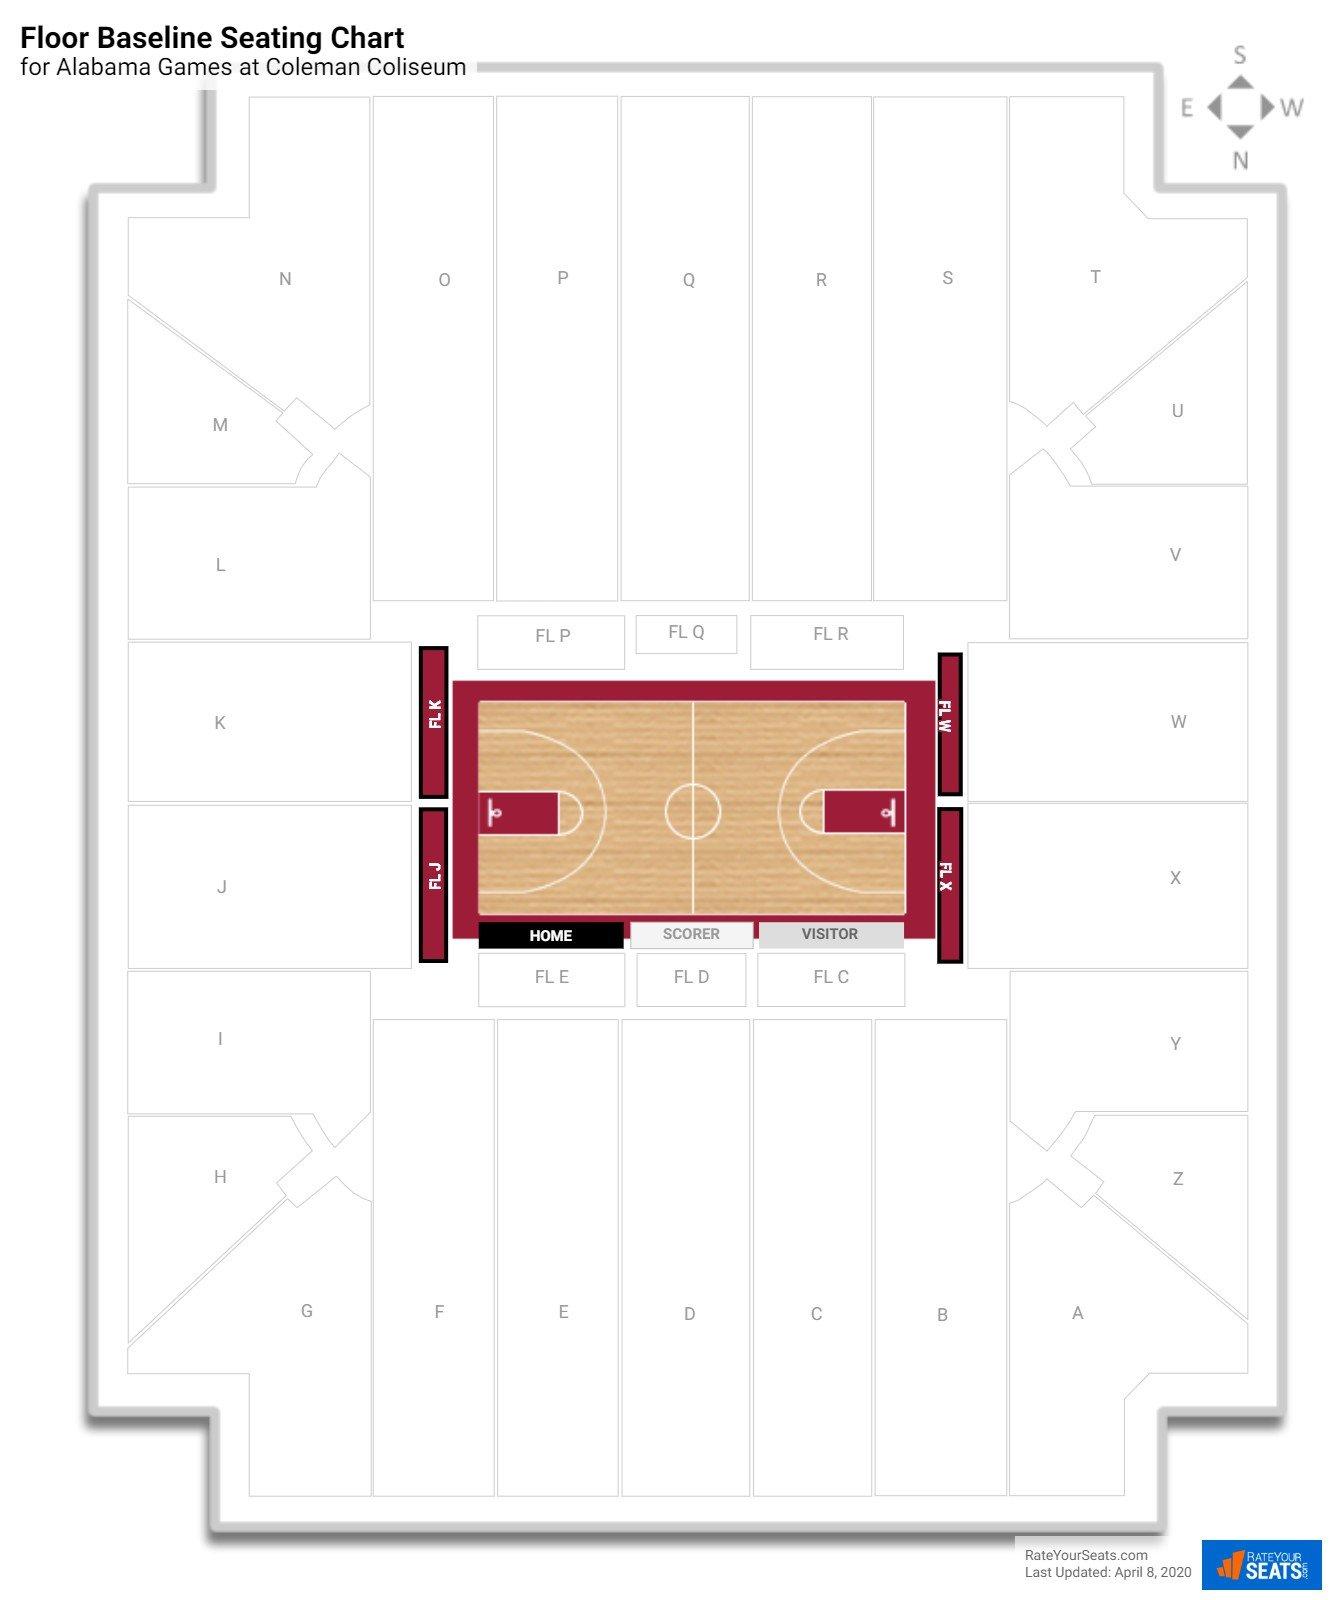 Coleman coliseum alabama seating guide rateyourseats coleman coliseum floor baseline seating chart nvjuhfo Choice Image